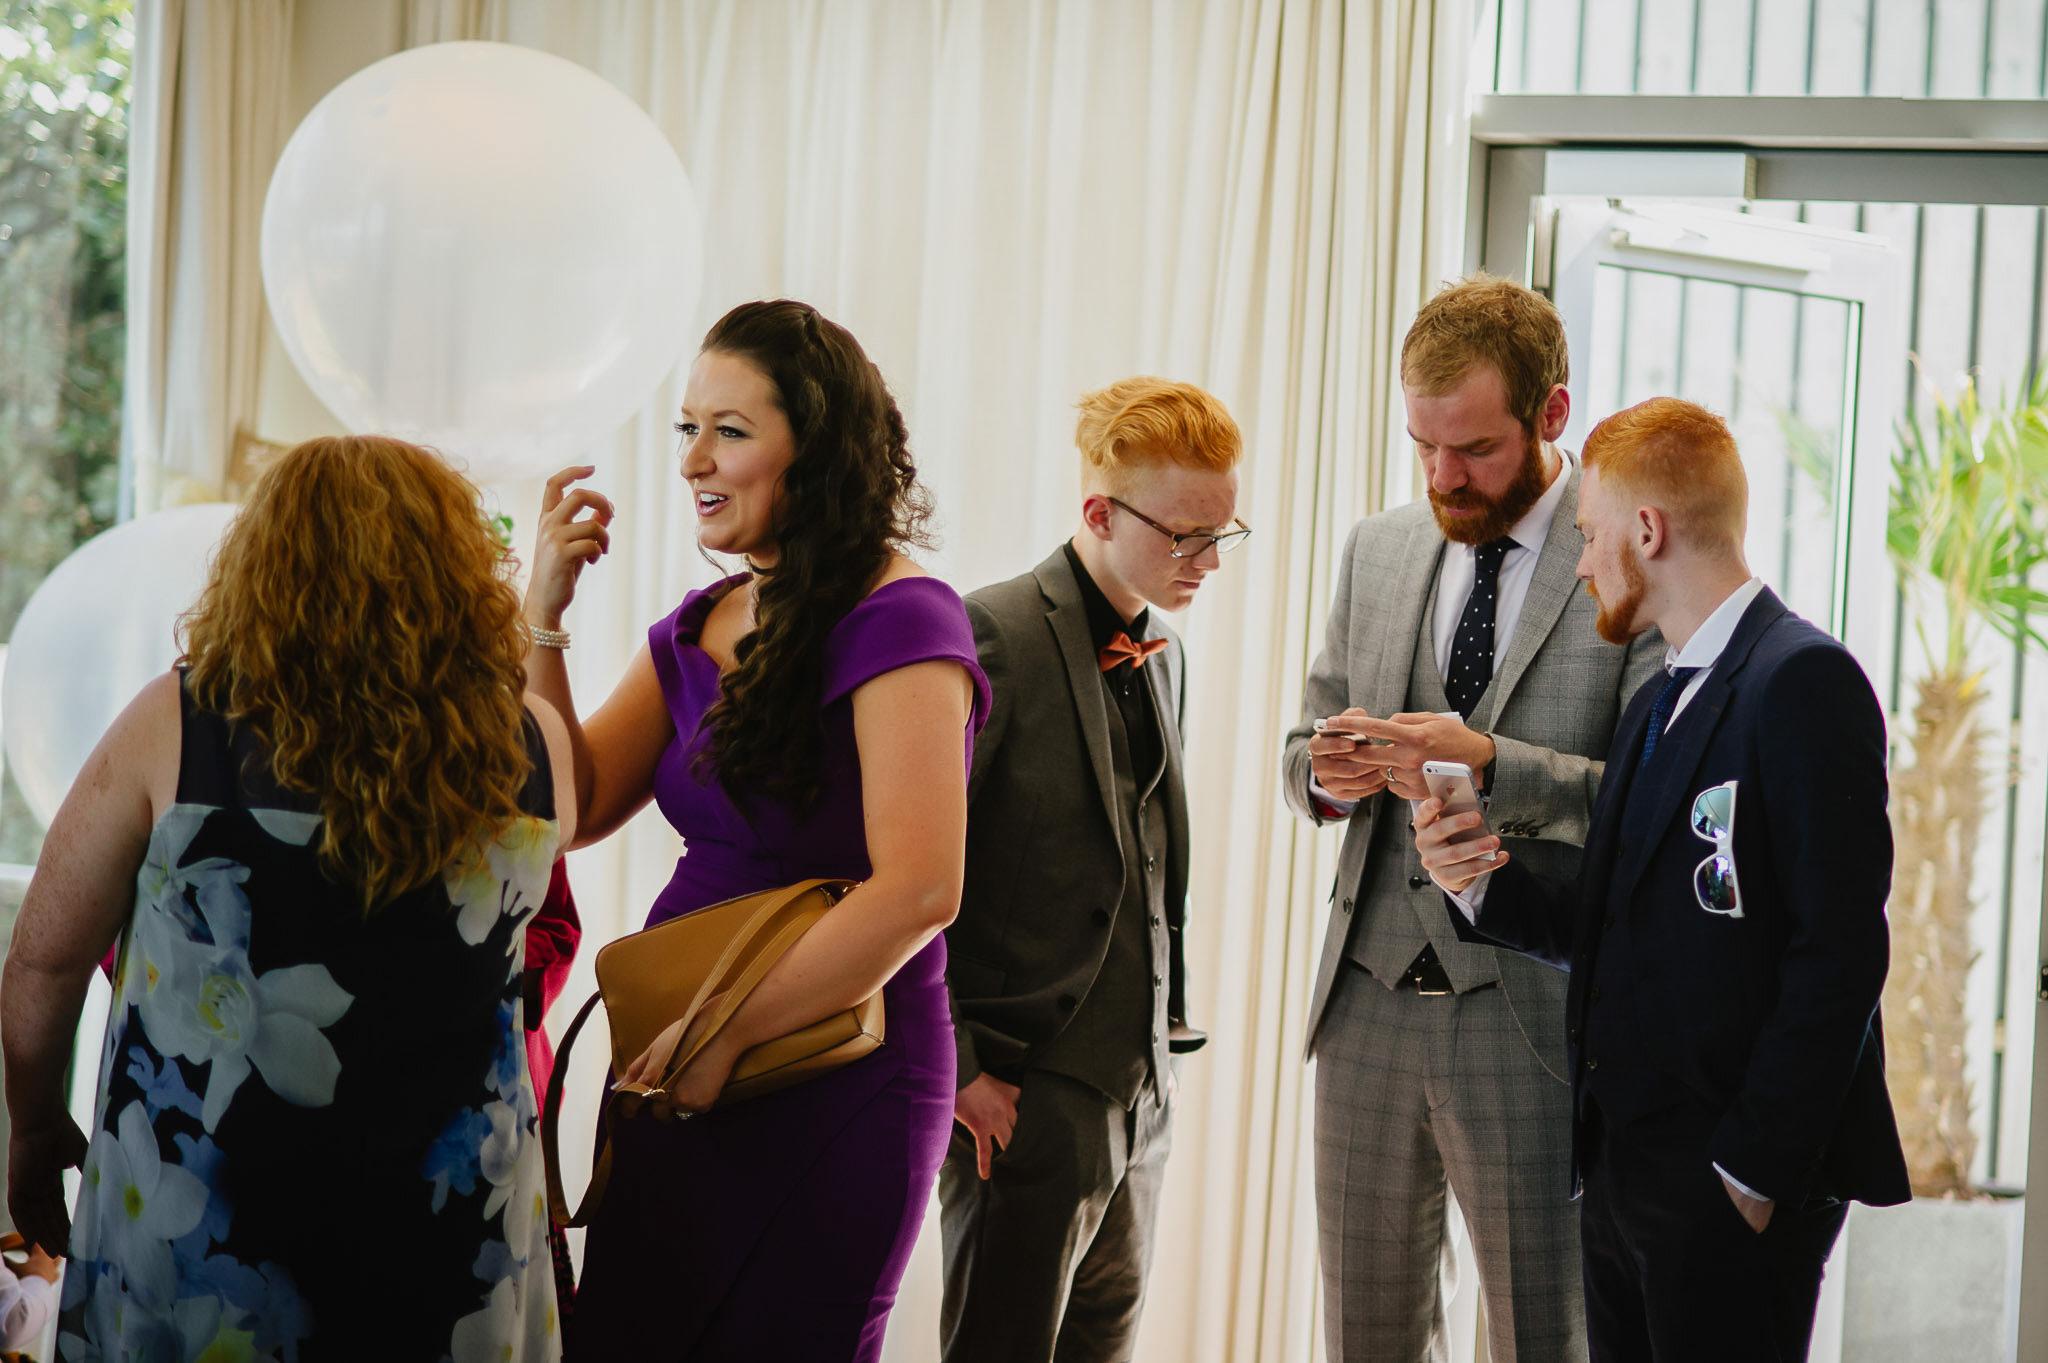 Cliff House Hotel Wedding Photographer Ireland-48.jpg